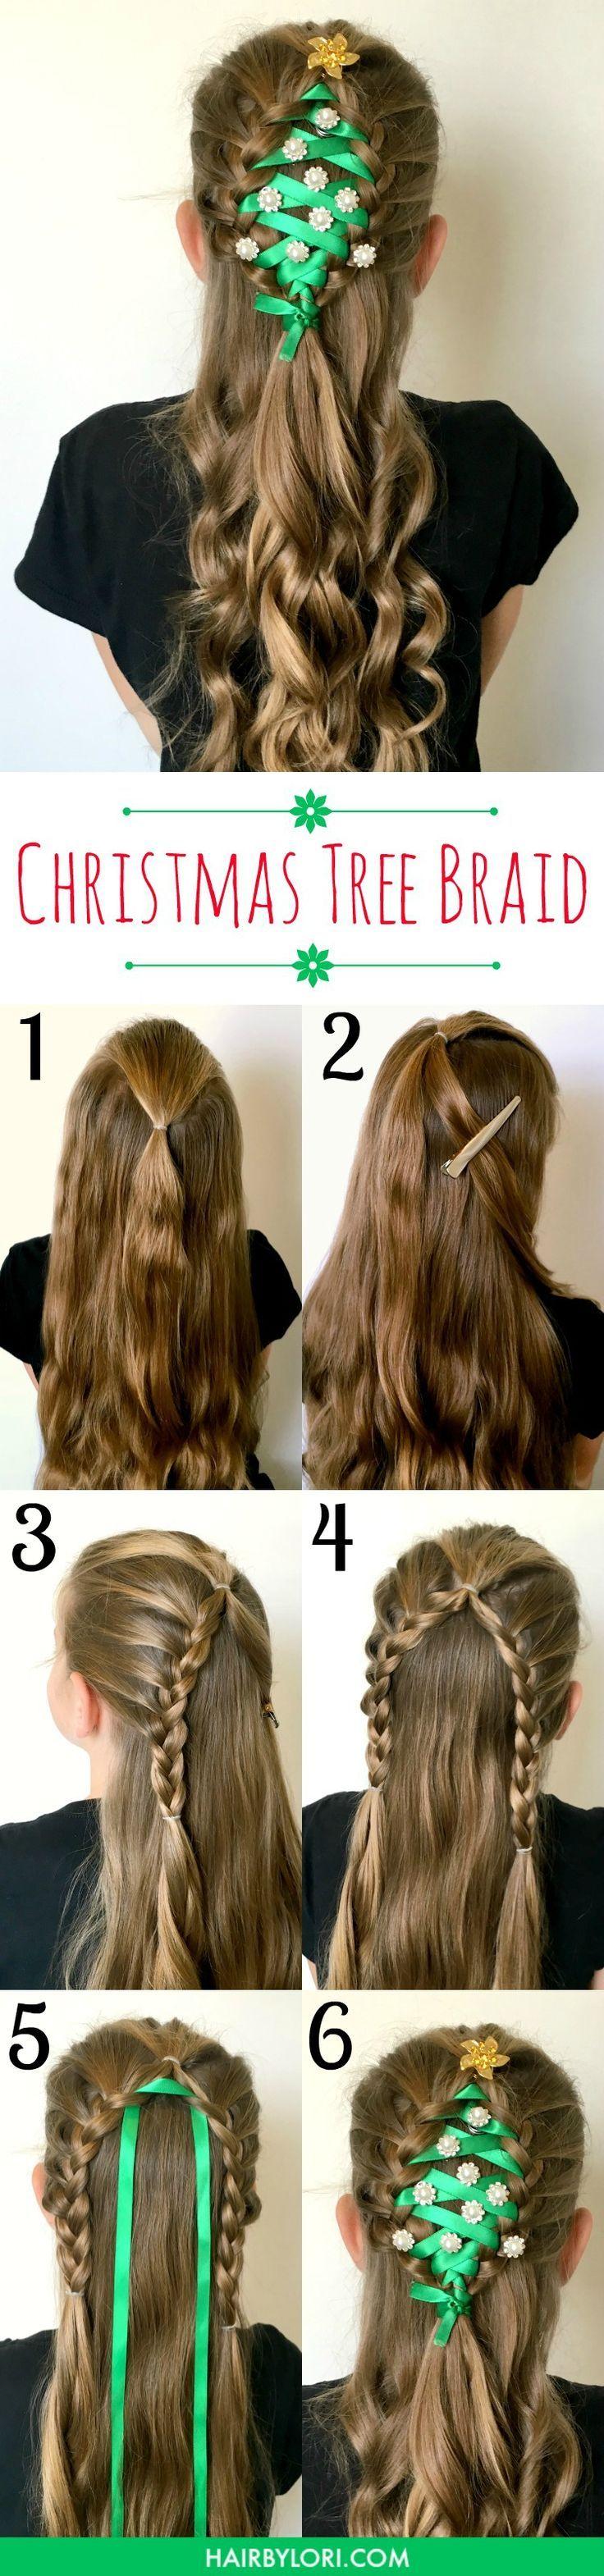 81 best Easy Hair Styles images on Pinterest